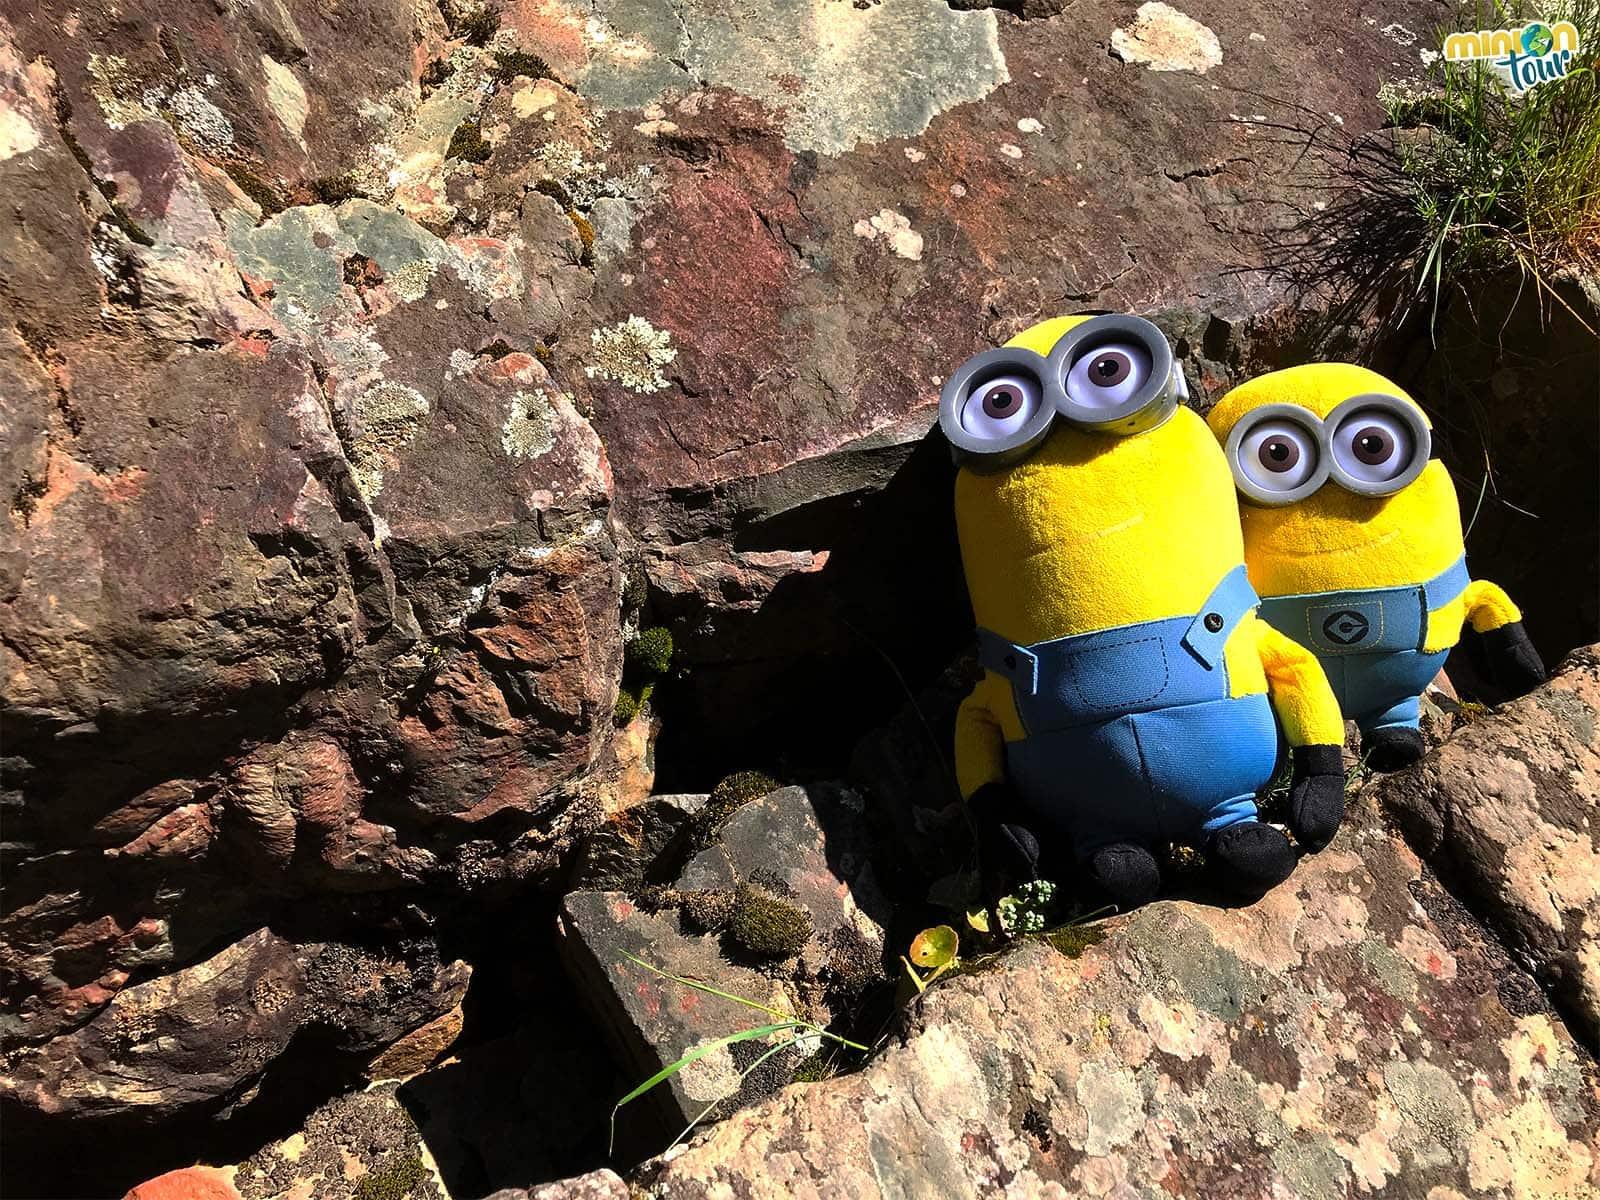 Hemos encontrado fósiles